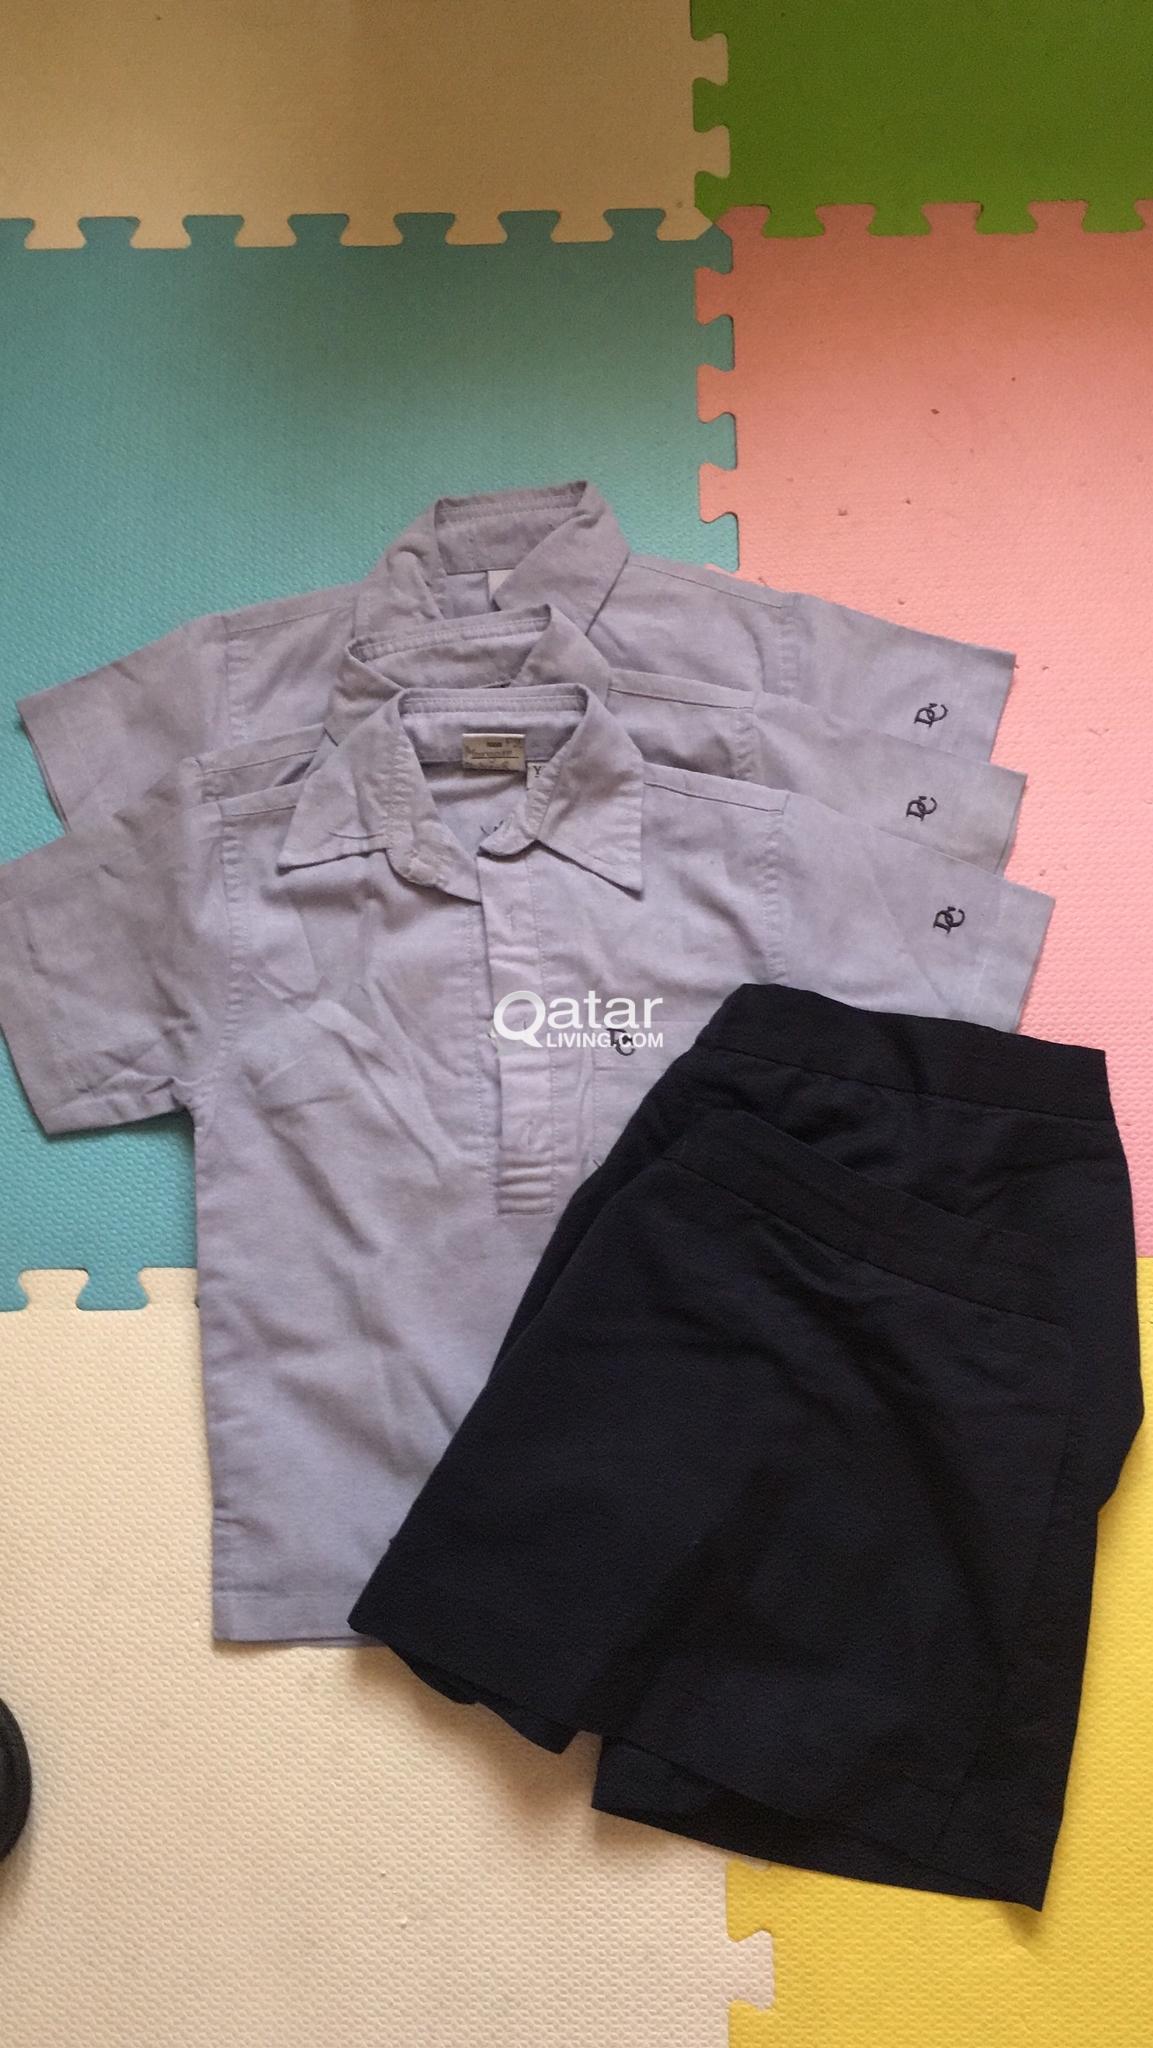 Doha college uniform